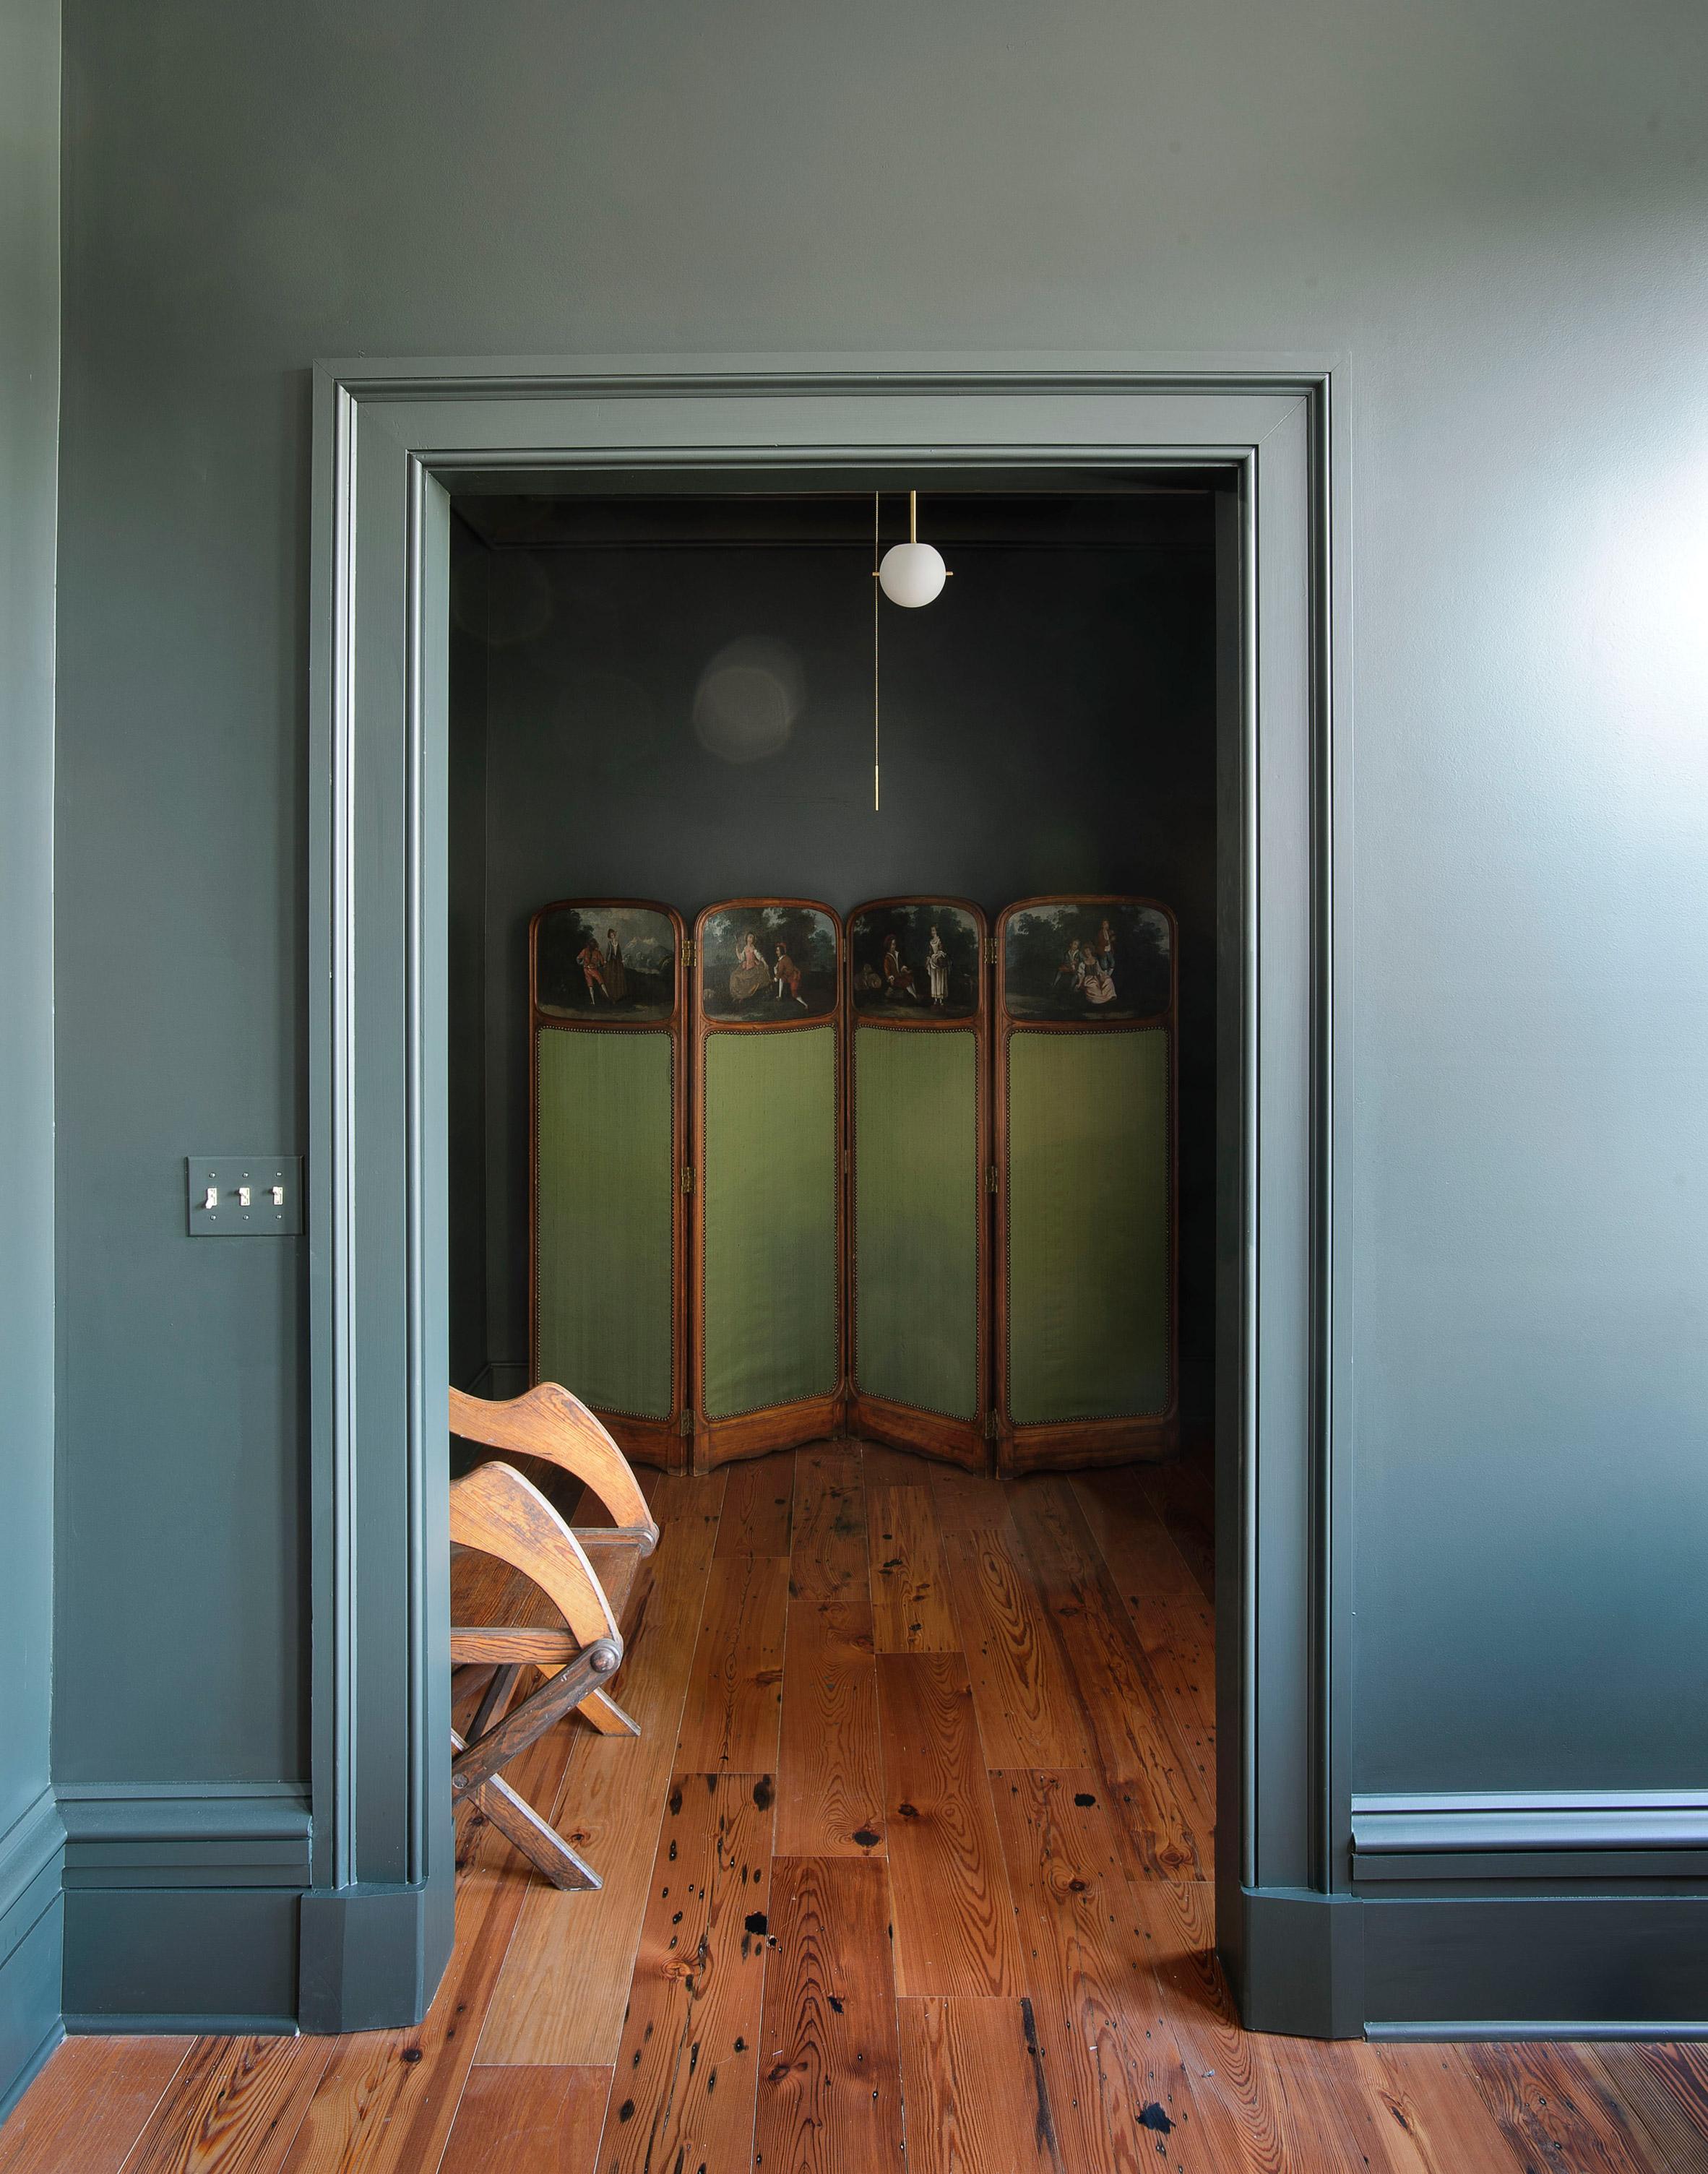 workstead-house-charleston-south-carolina-renovation-workstead_dezeen_2364_col_15.jpg